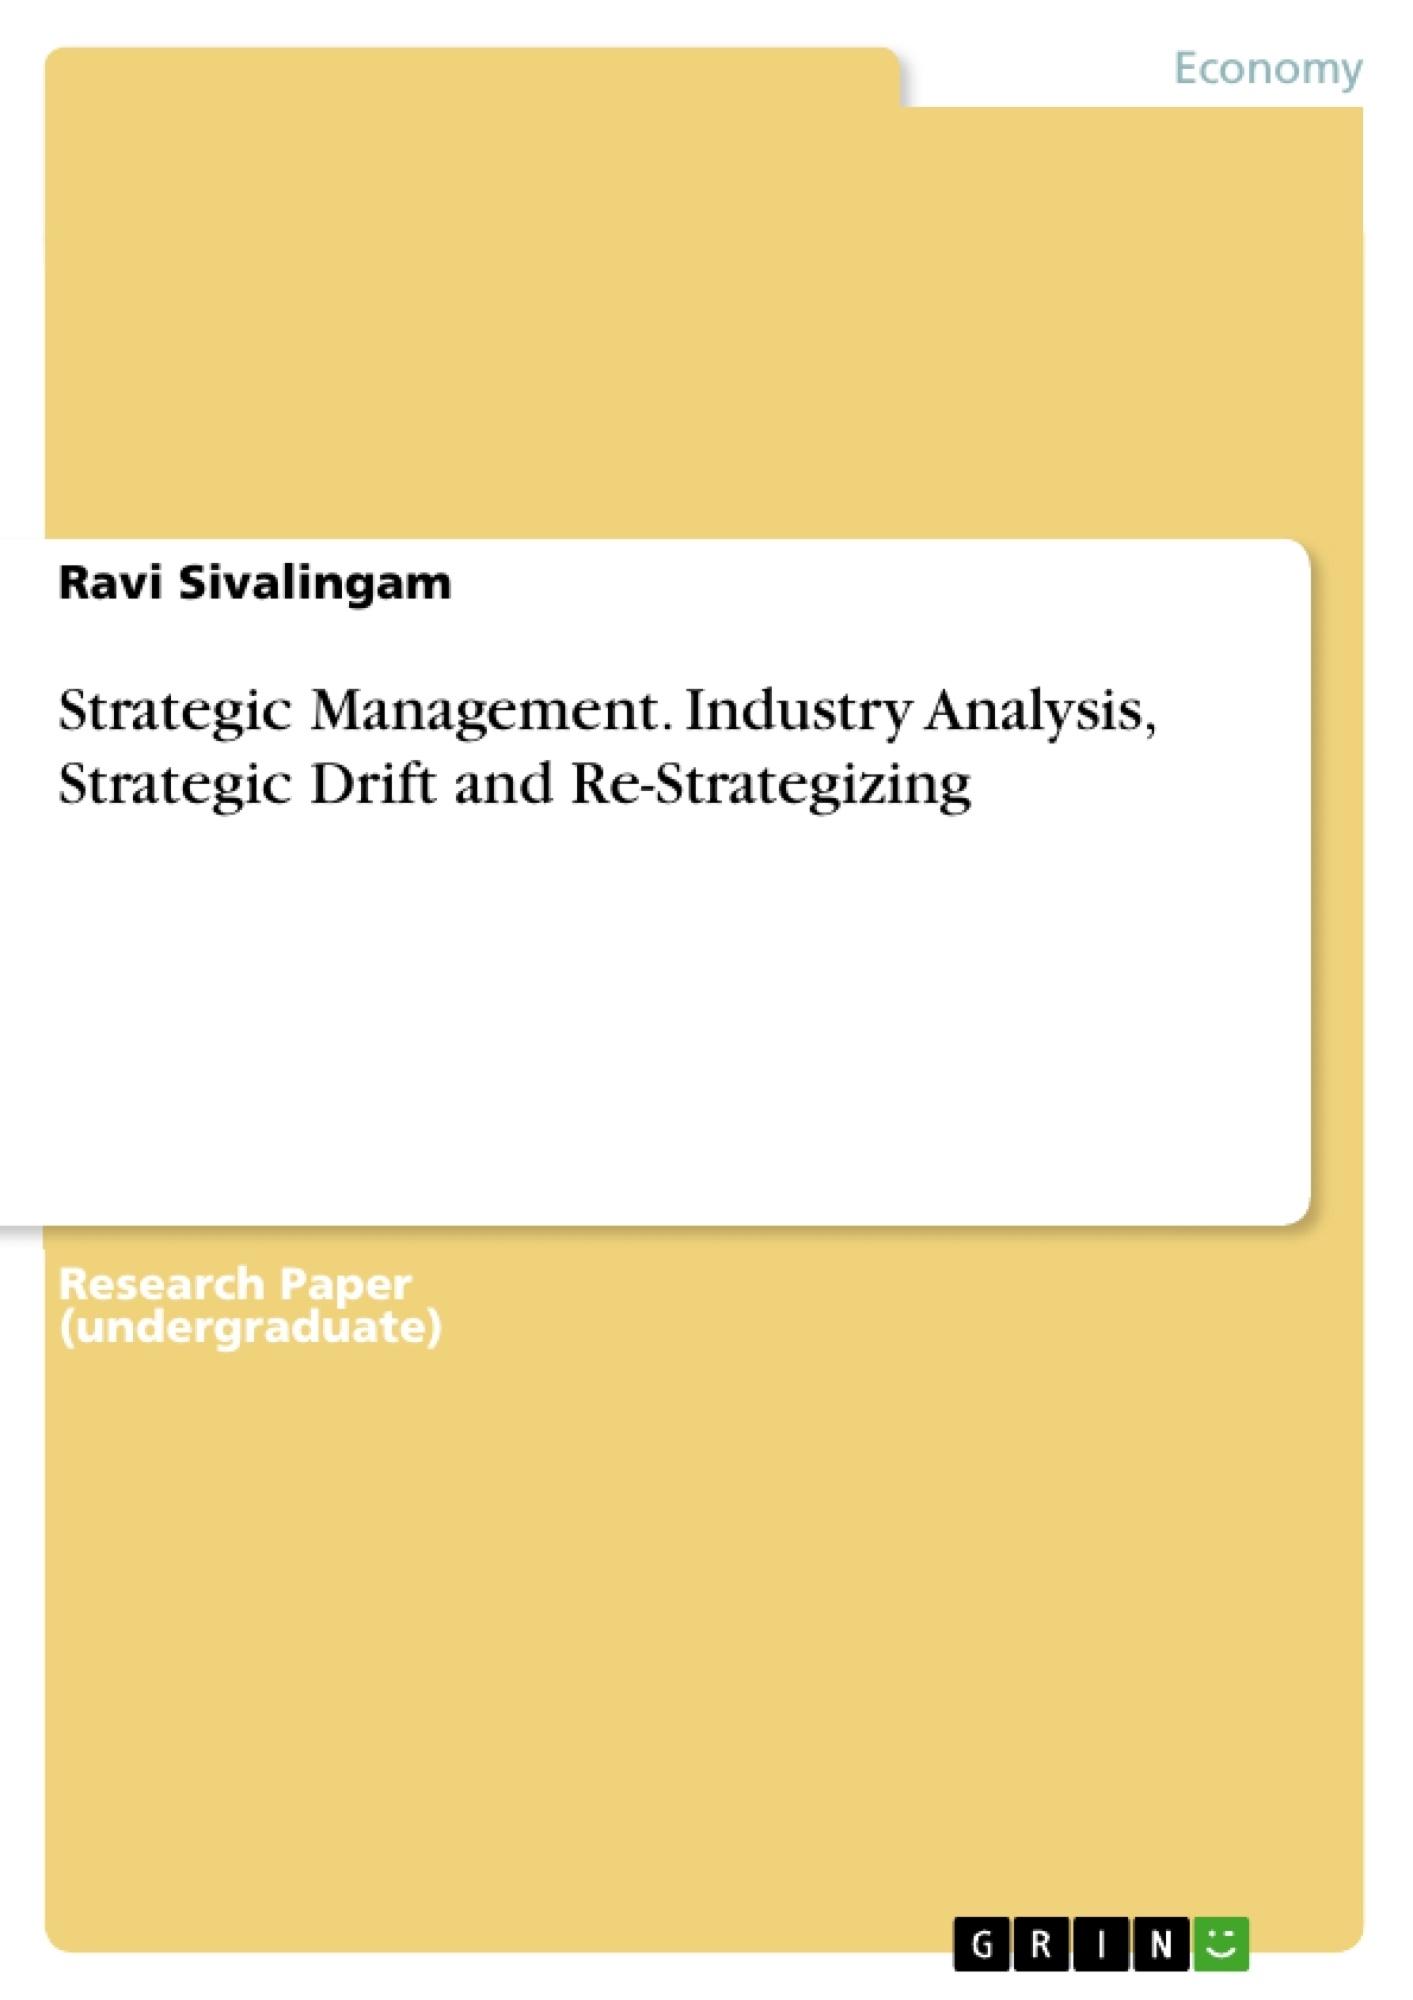 Title: Strategic Management. Industry Analysis, Strategic Drift and Re-Strategizing